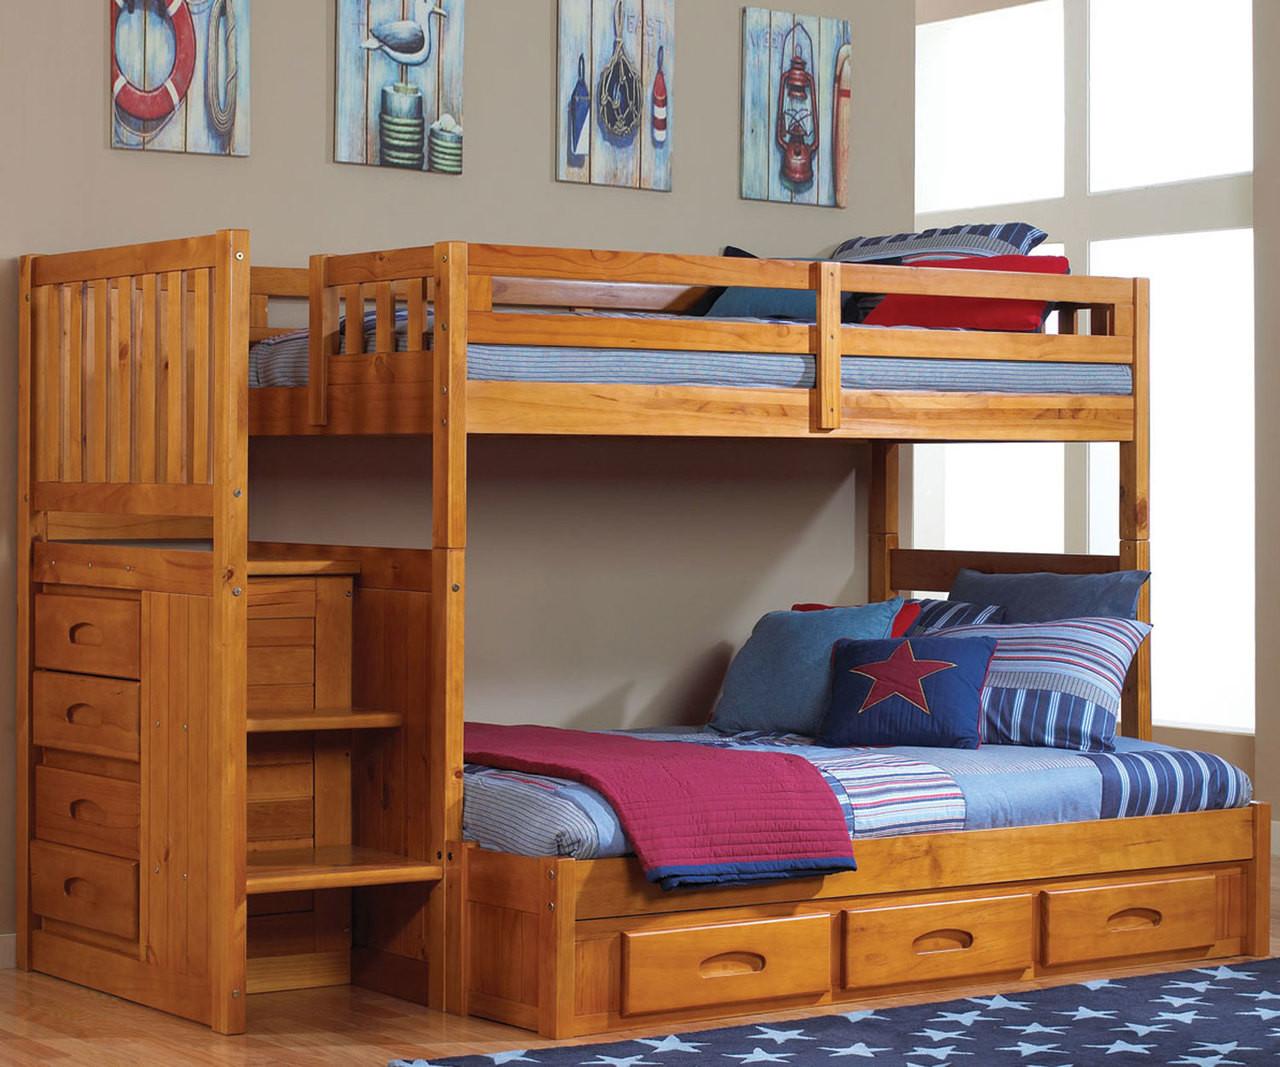 Where Can I Buy Kids Furniture